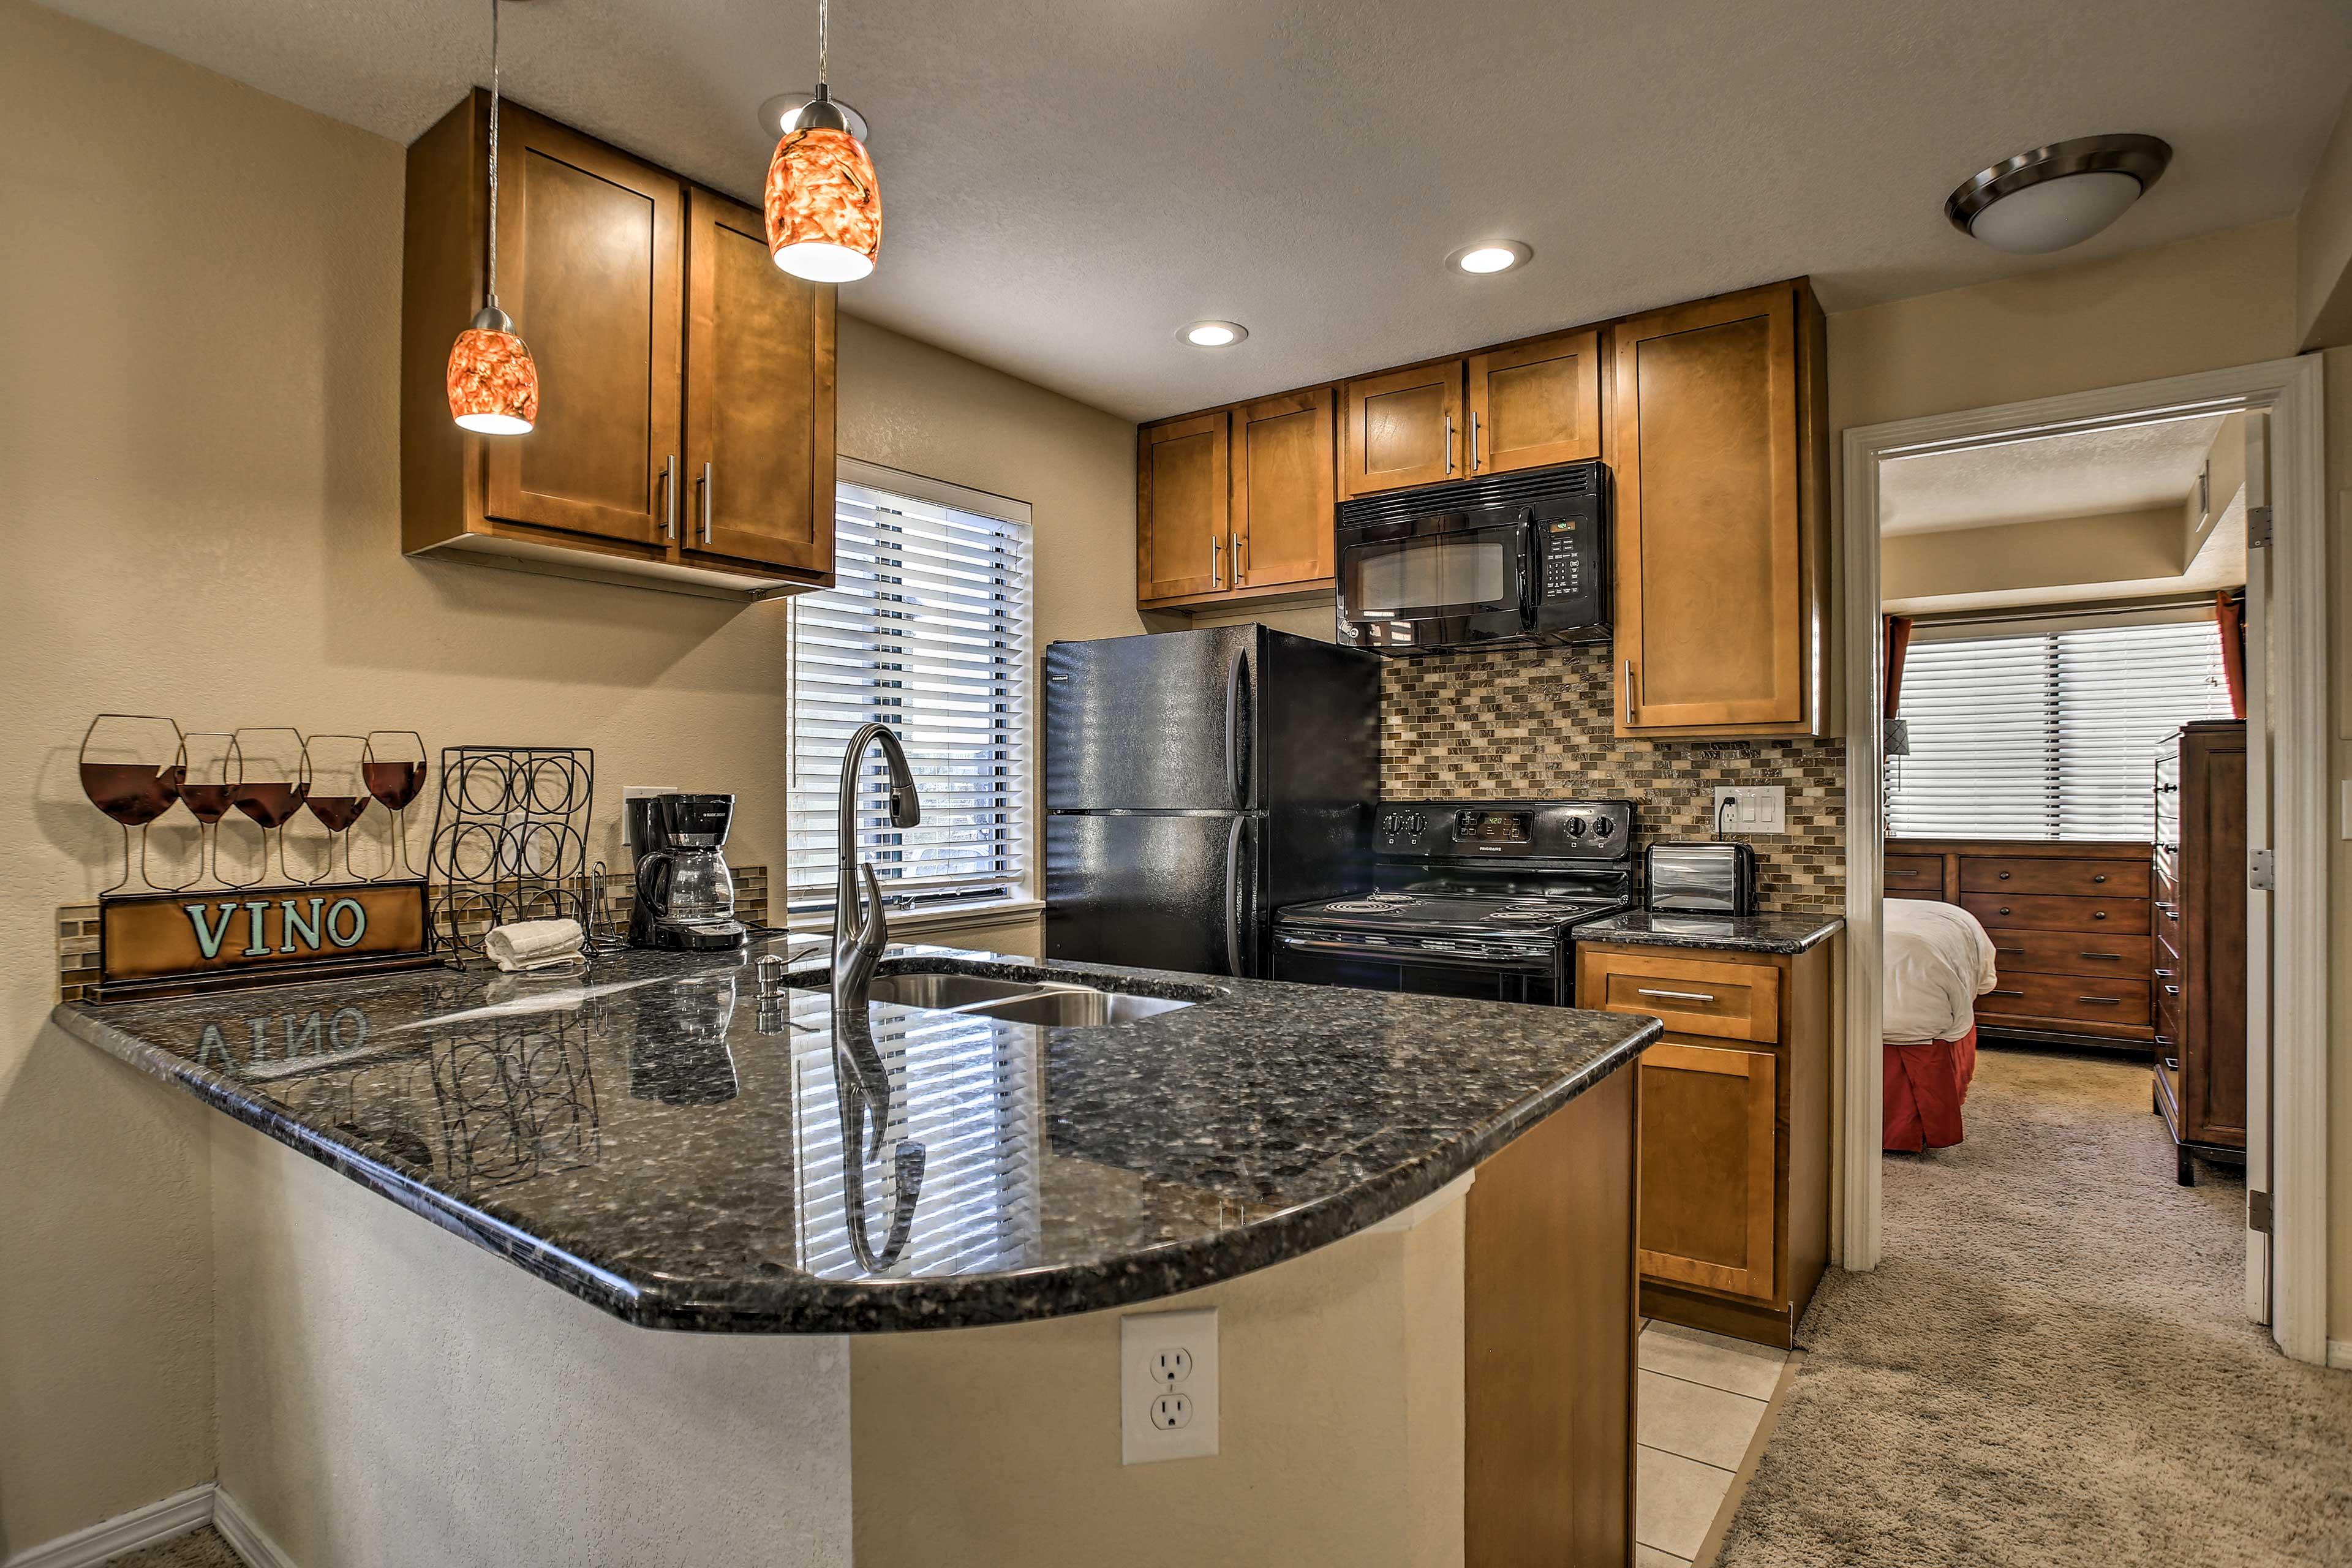 The kitchen boasts beautiful granite counters.